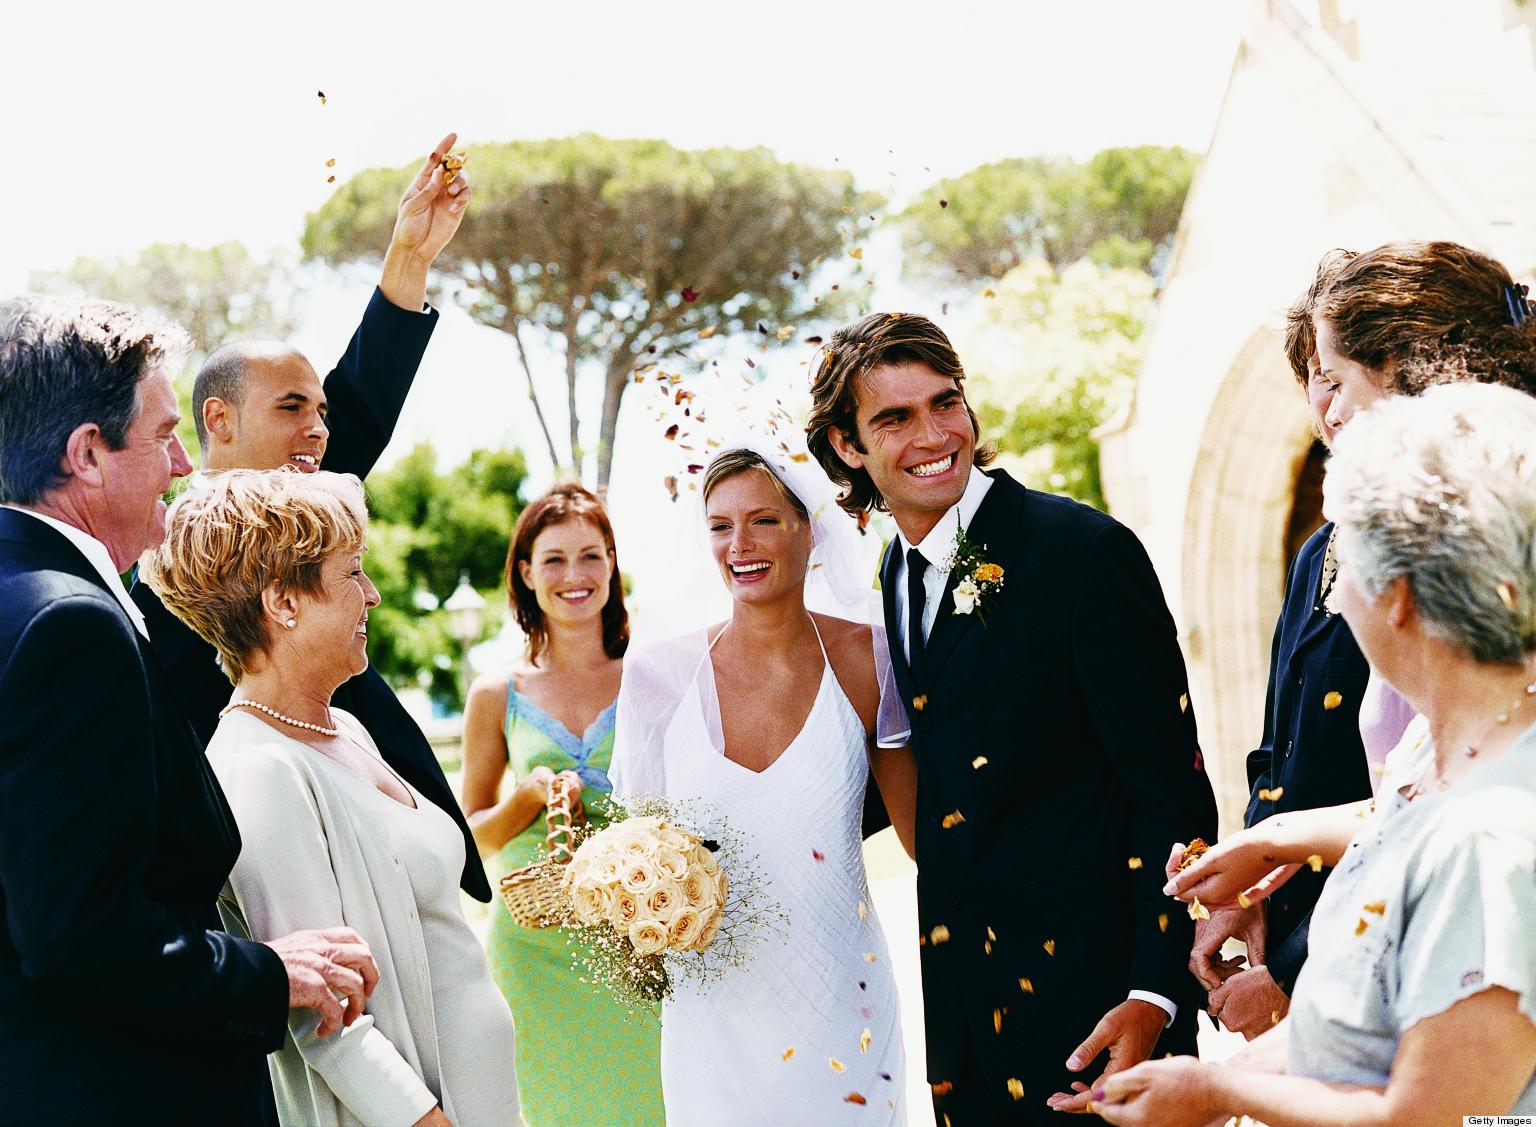 are wedding loans smart wedding planning money management